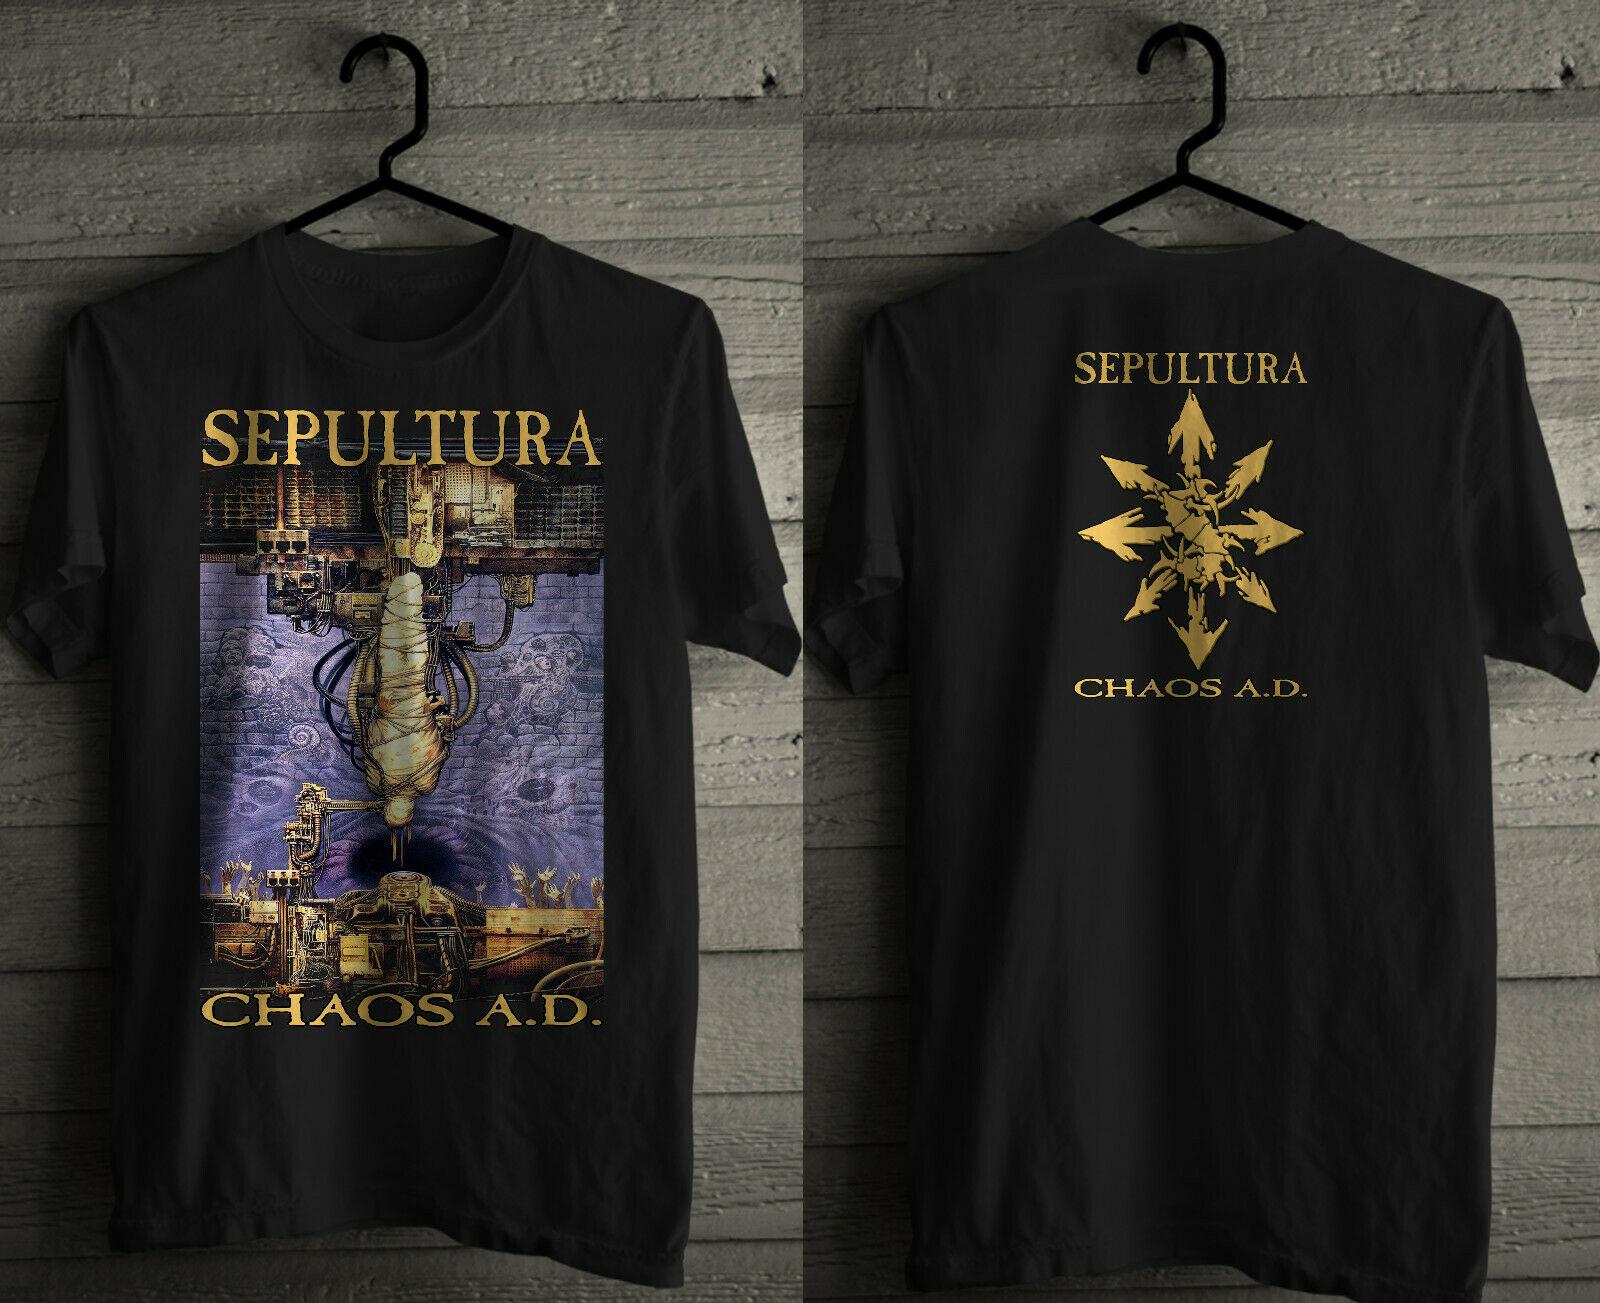 SEPULTURA CHAOS A D NEW MEN'S BLACK T SHIRT SLAYER PANTERA SOULFLY KREATOR  2019 New Short Sleeve